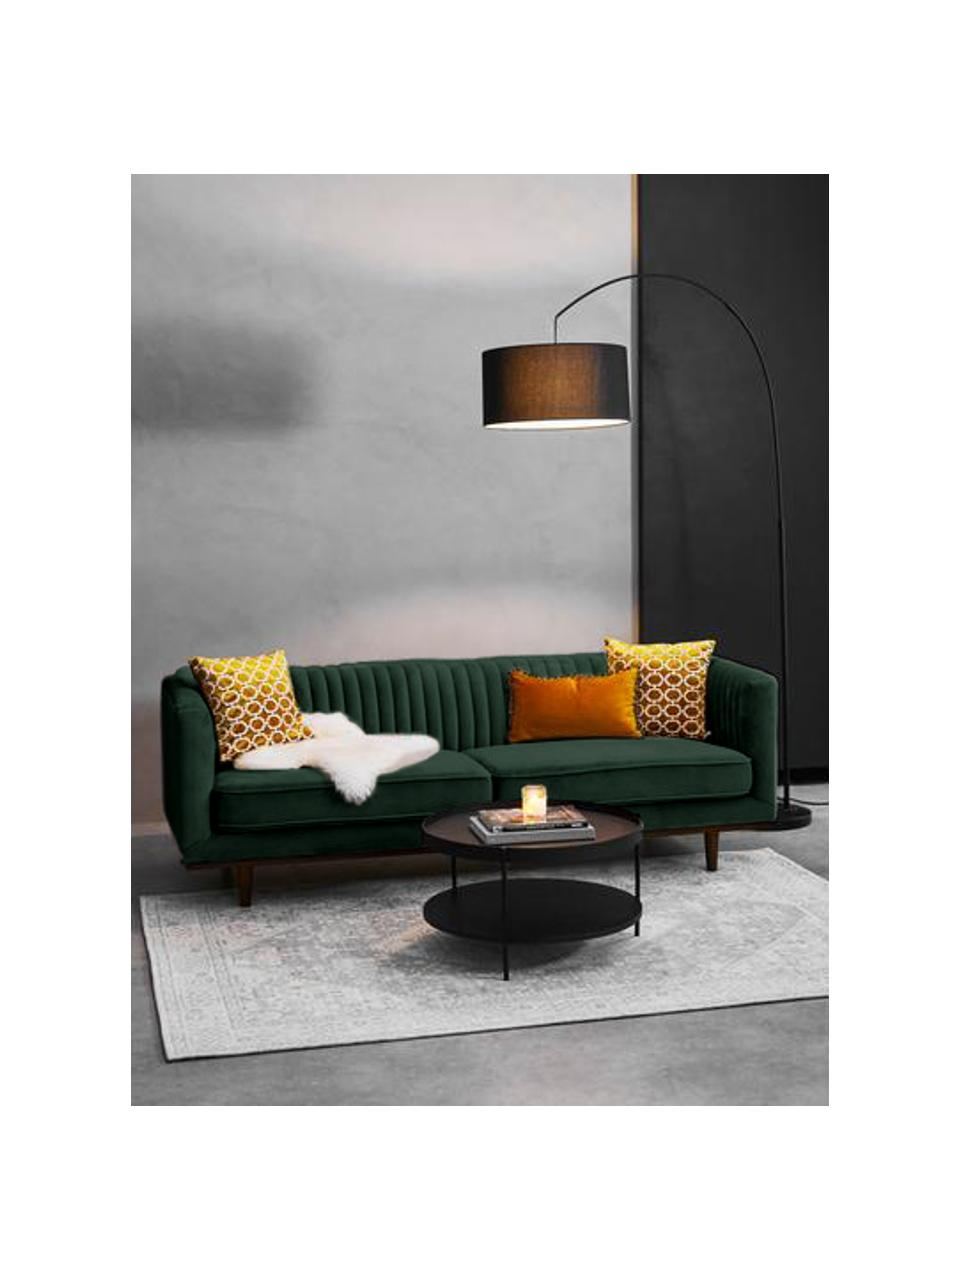 Samt-Sofa Dante (3-Sitzer) in Grün mit Holz-Füßen, Bezug: Polyestersamt, Gestell: Kautschukbaumholz, klarla, Samt Grün, B 210 x T 87 cm